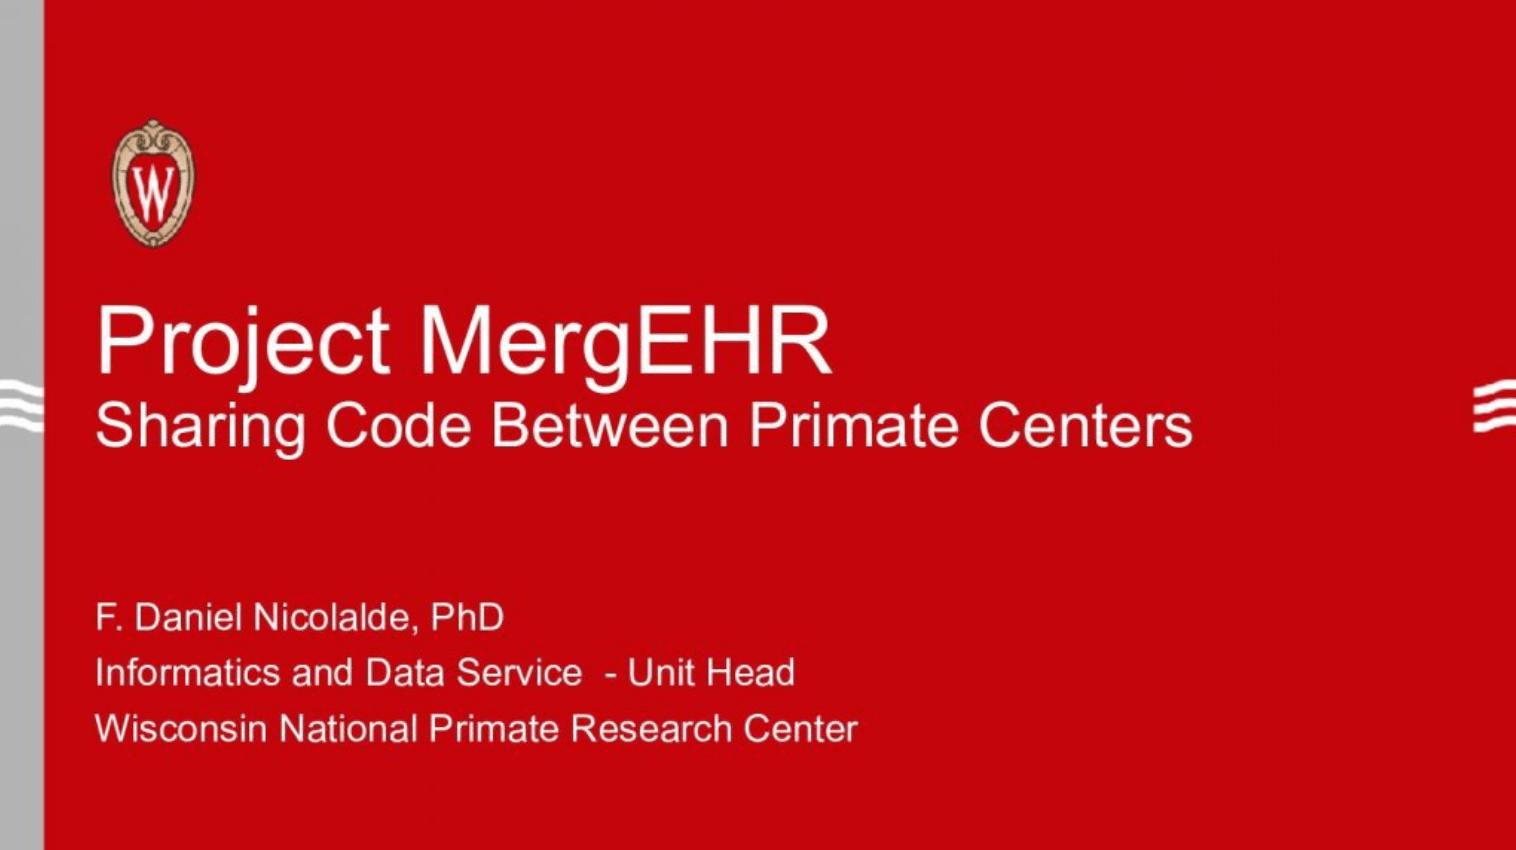 Project MergEHR: Sharing Code Between Primate Centers